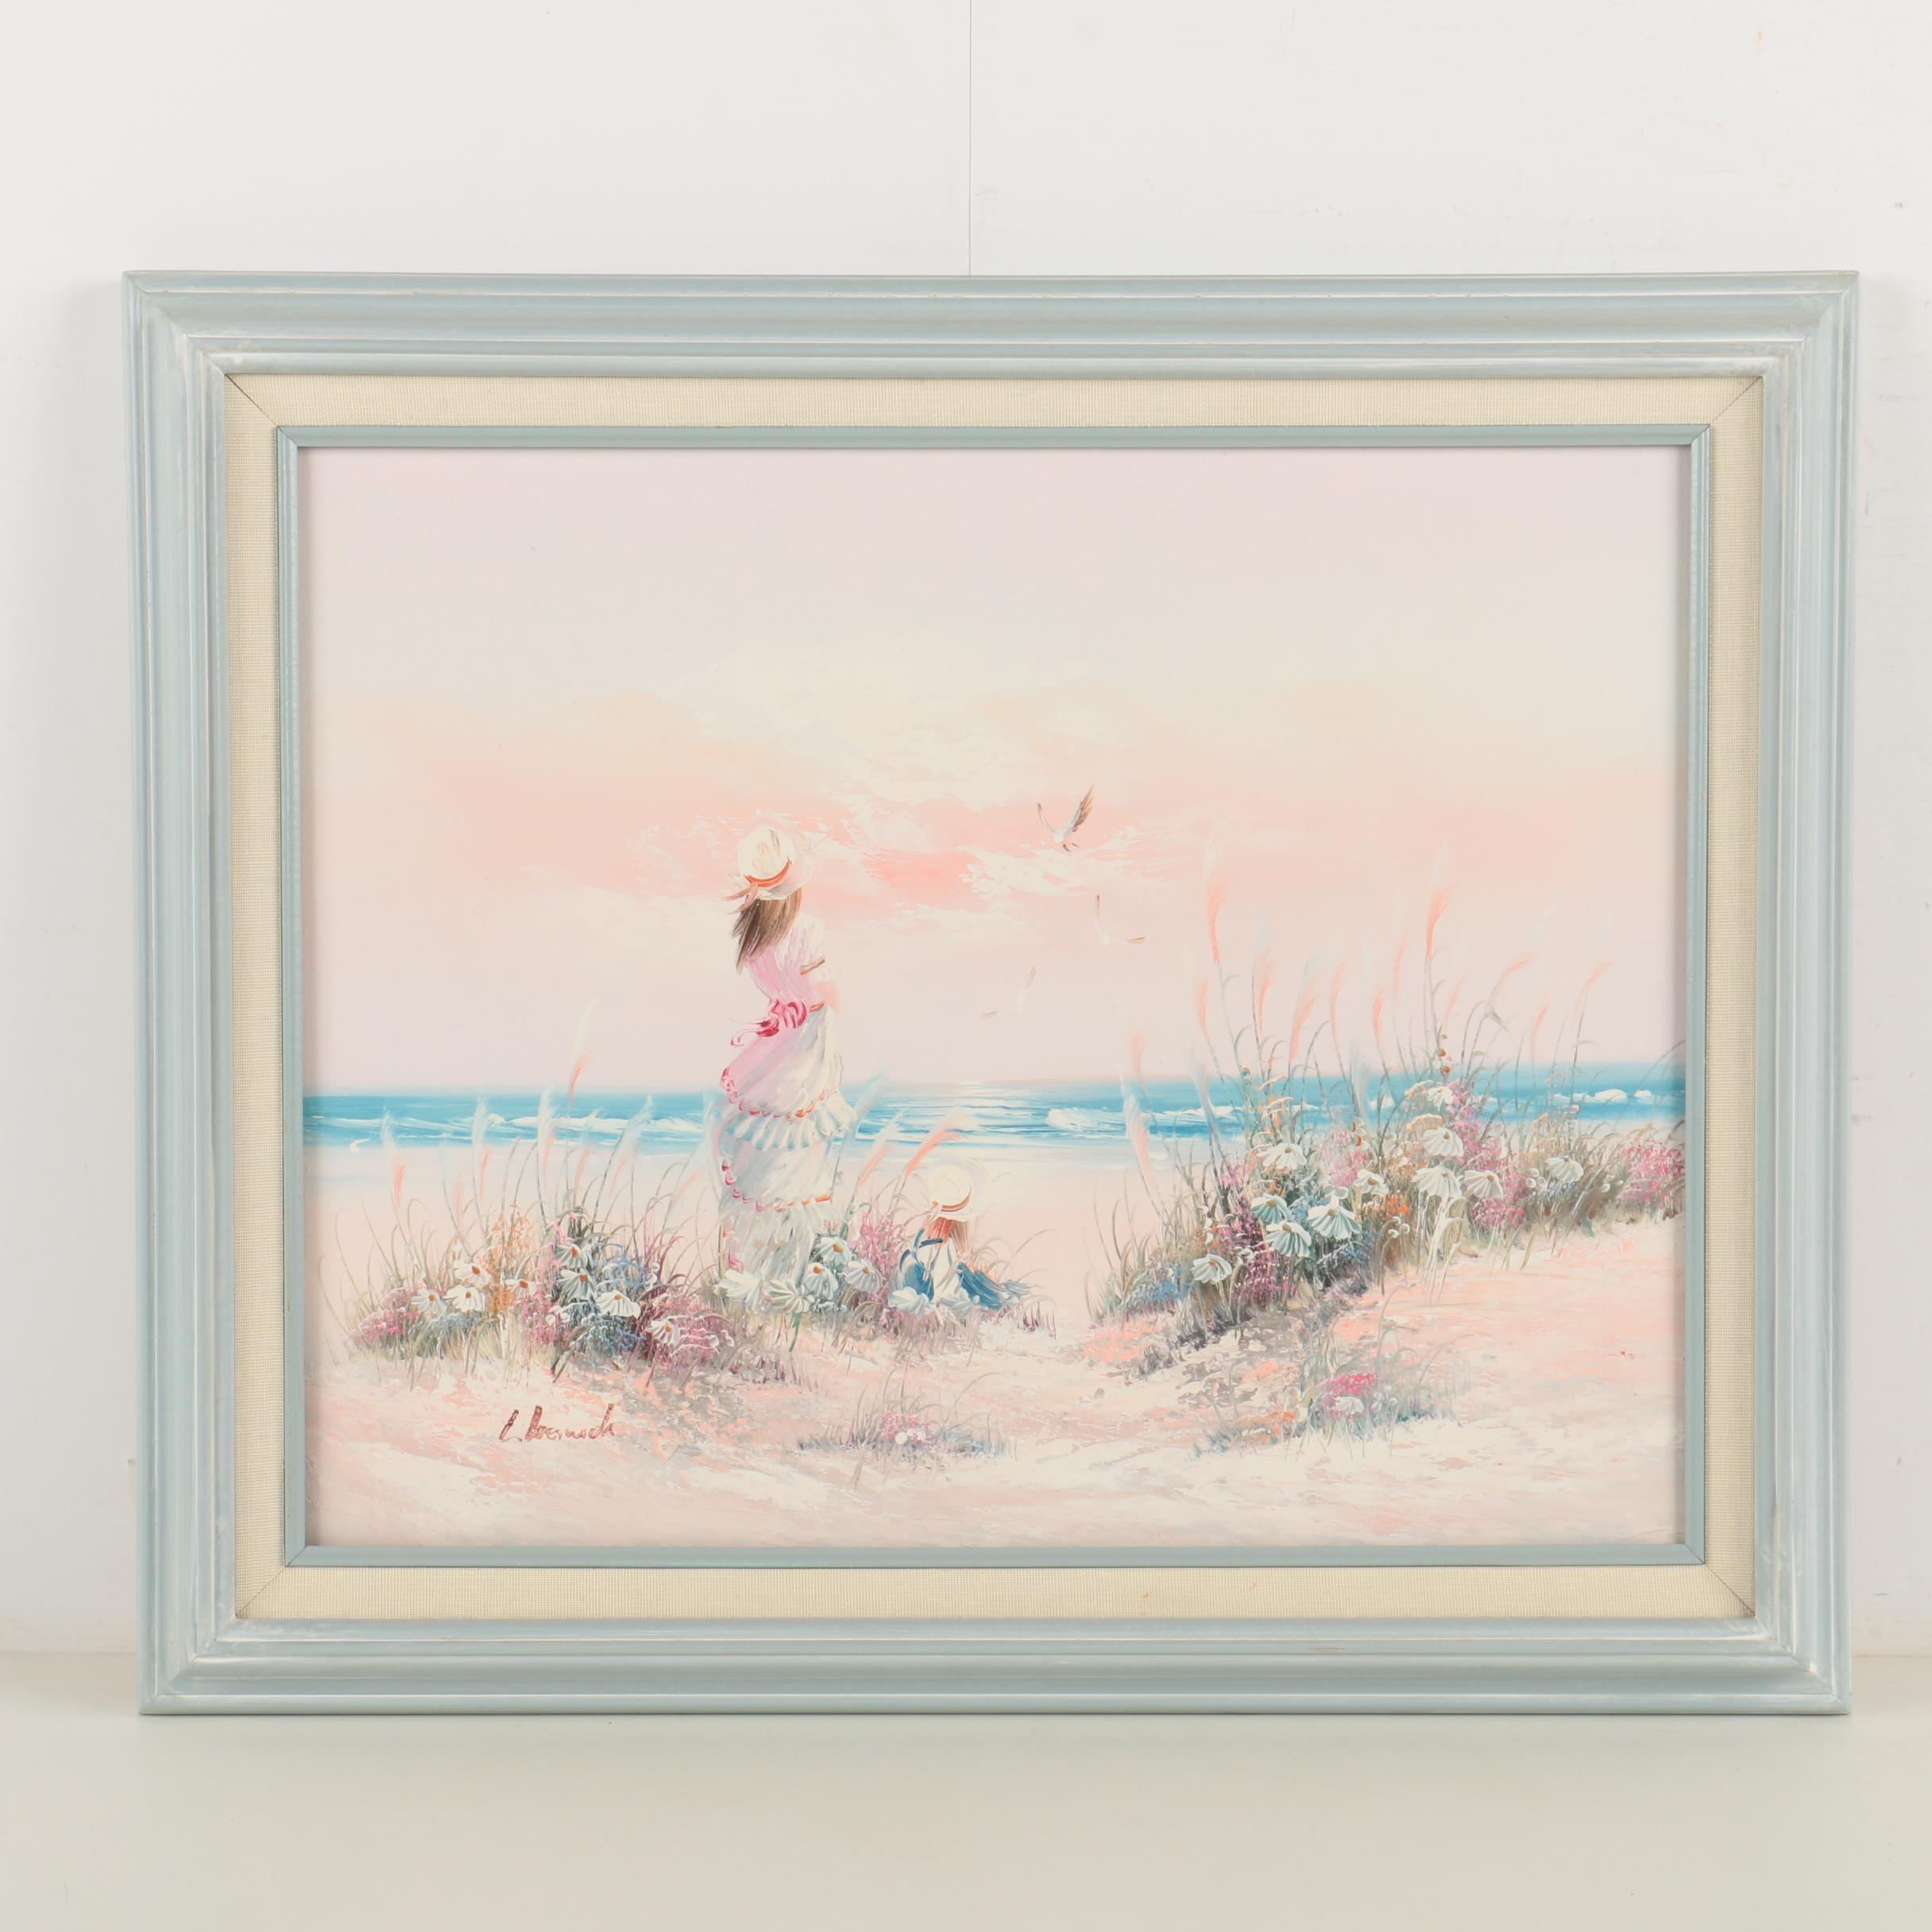 L. Keswick Oil Painting on Canvas of Beach Scene